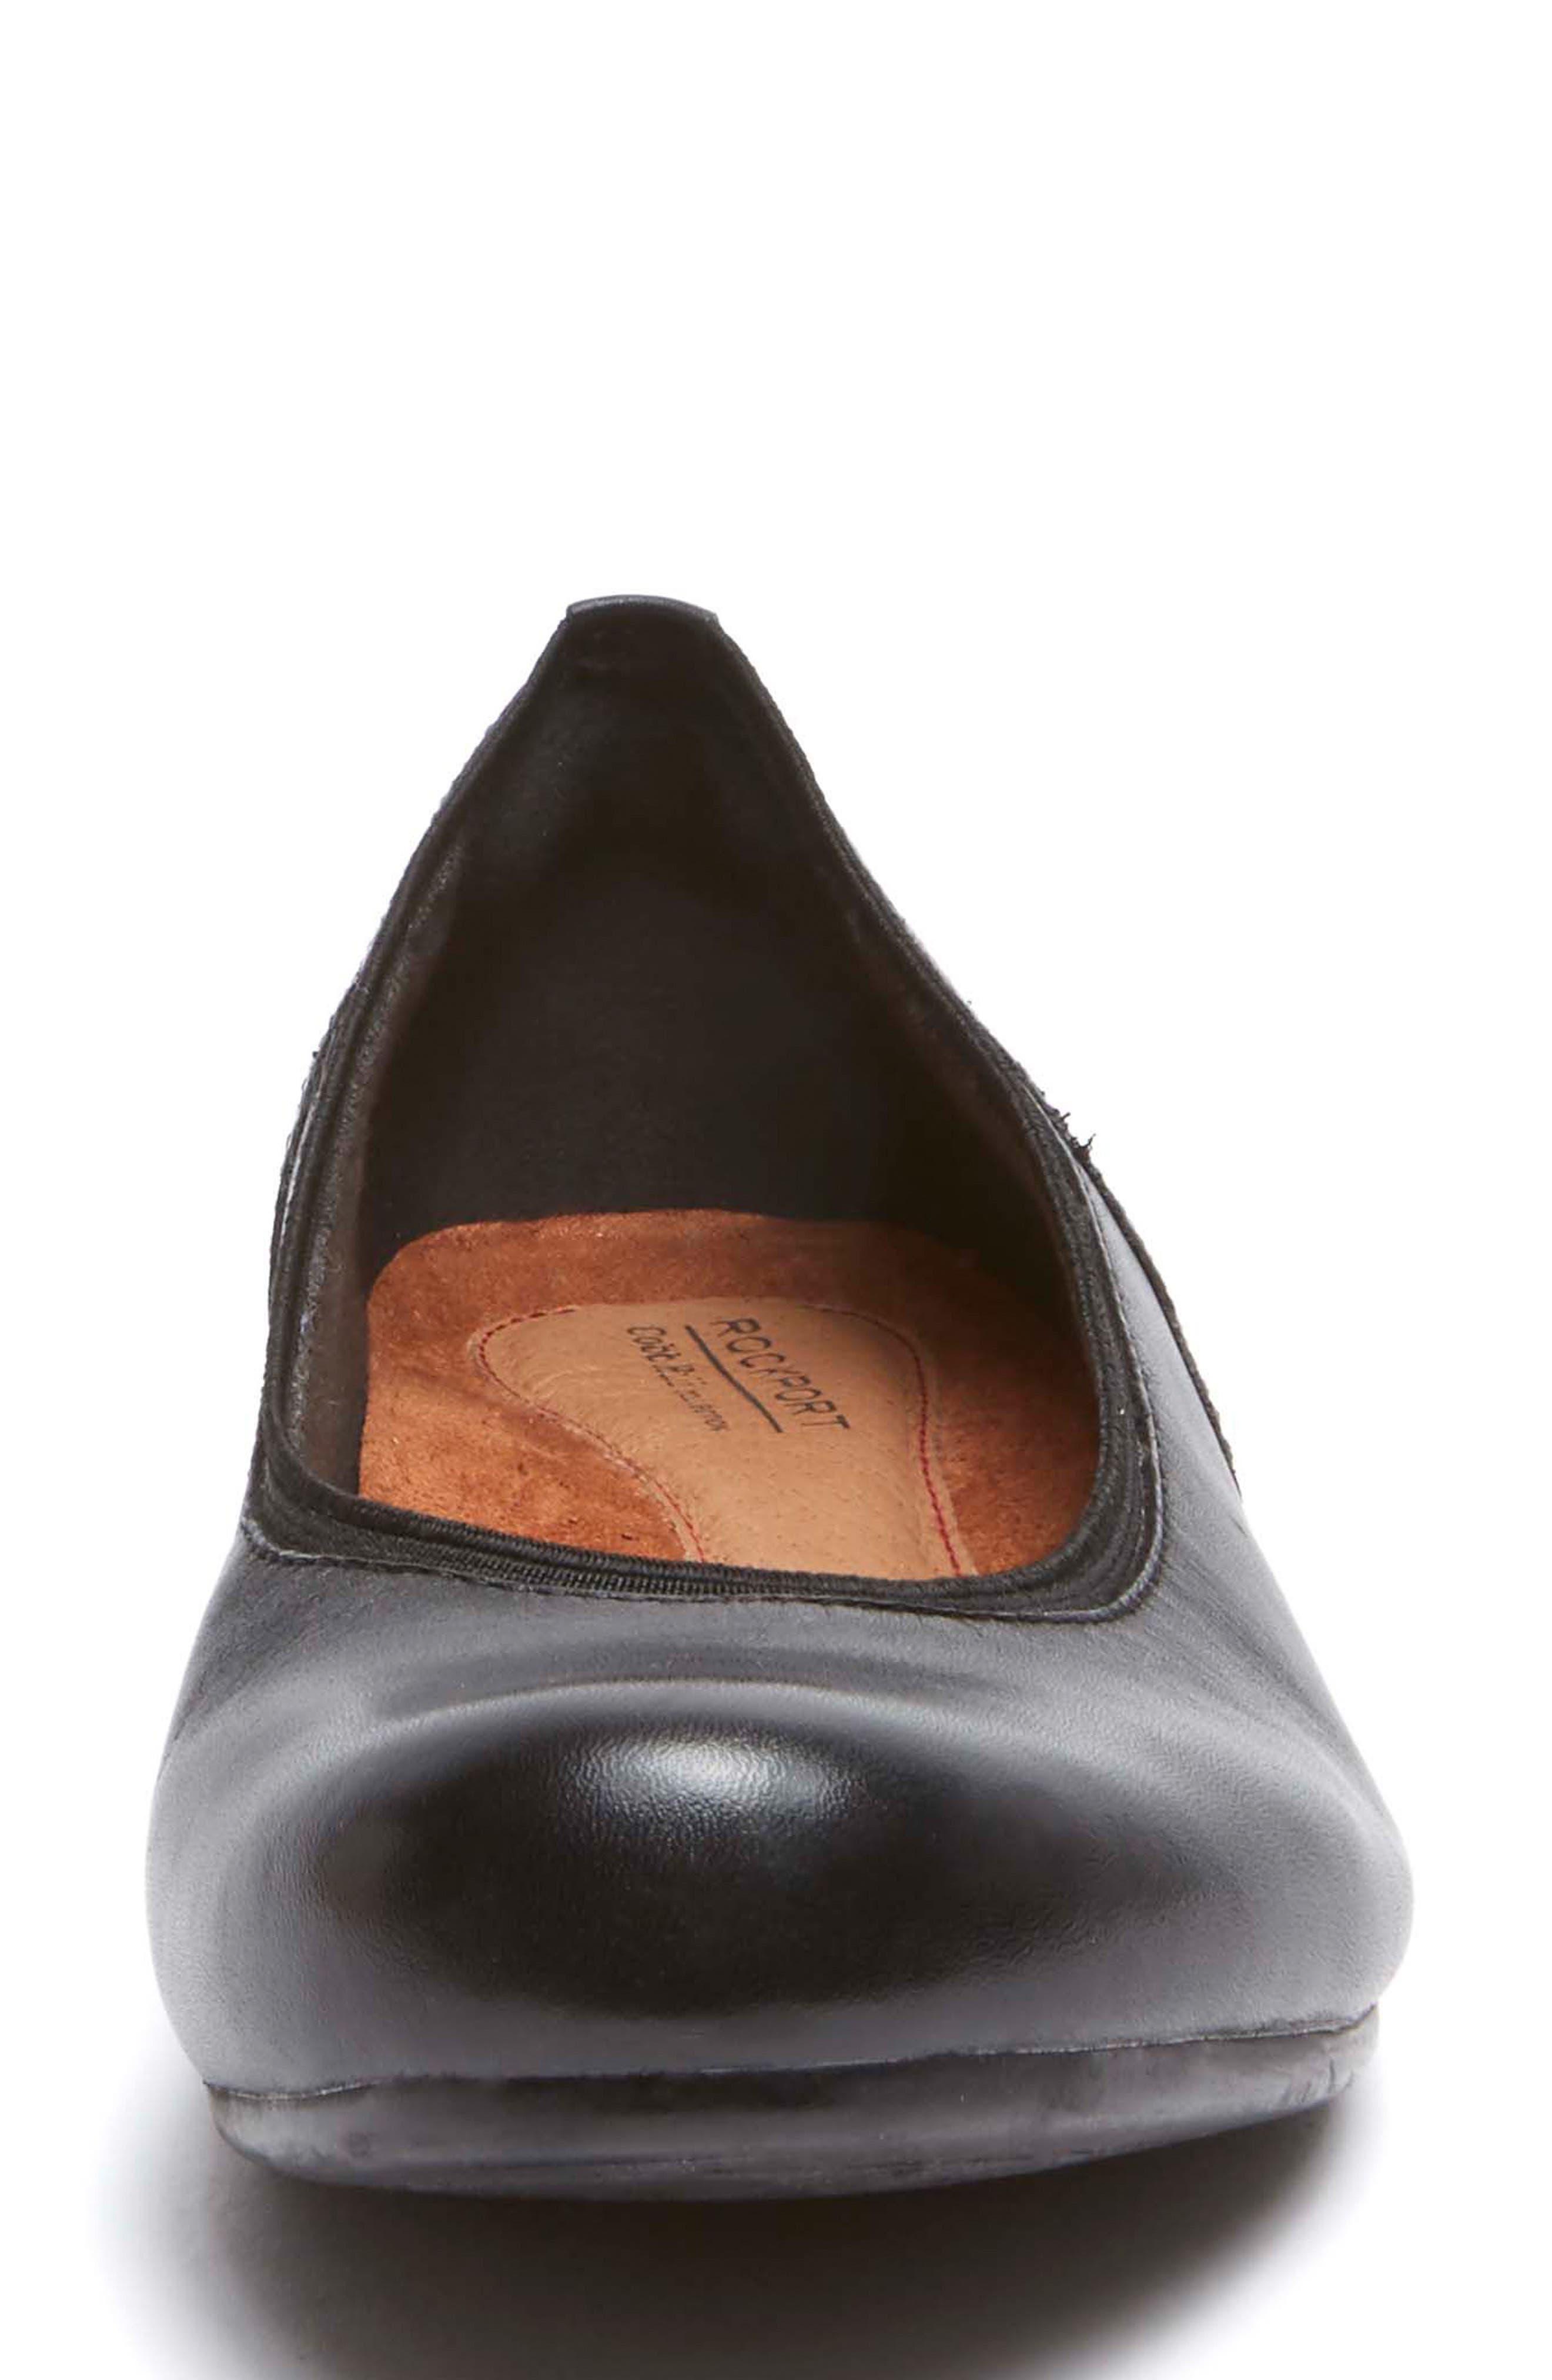 Sharleen Wedge Pump,                             Alternate thumbnail 4, color,                             Black Leather